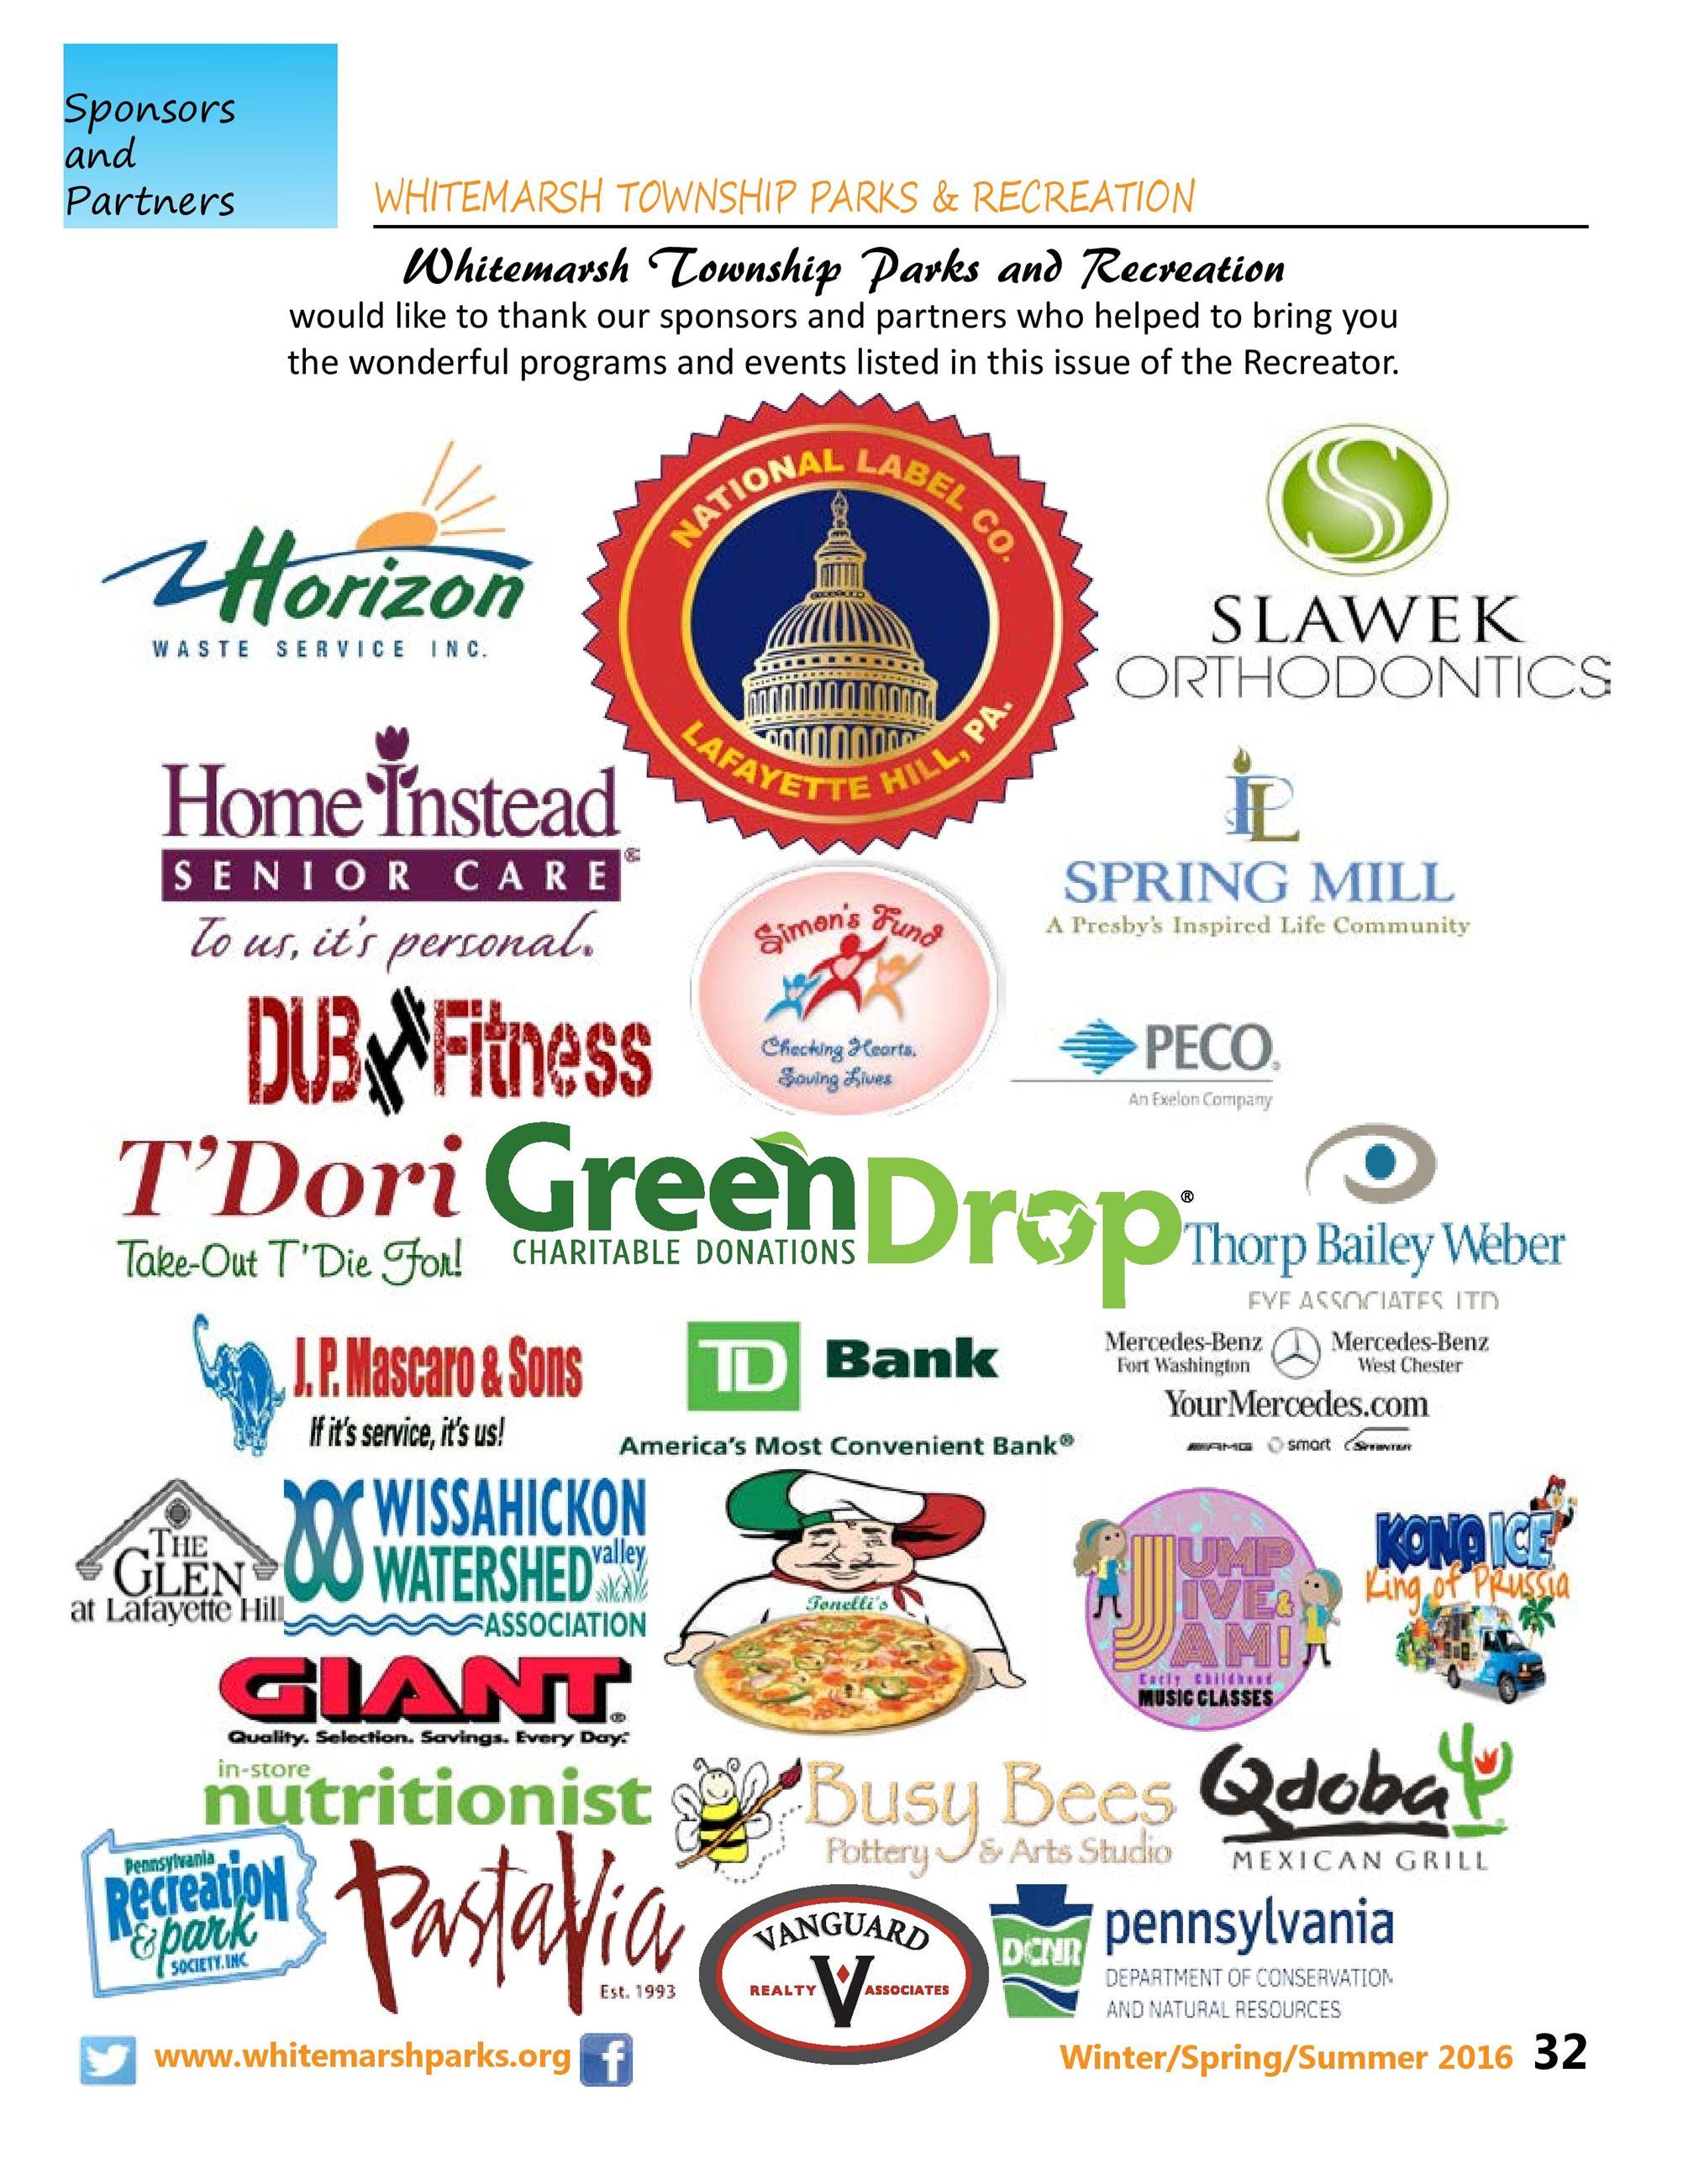 Partners & Sponsors - Winter/Spring/Summer 2016